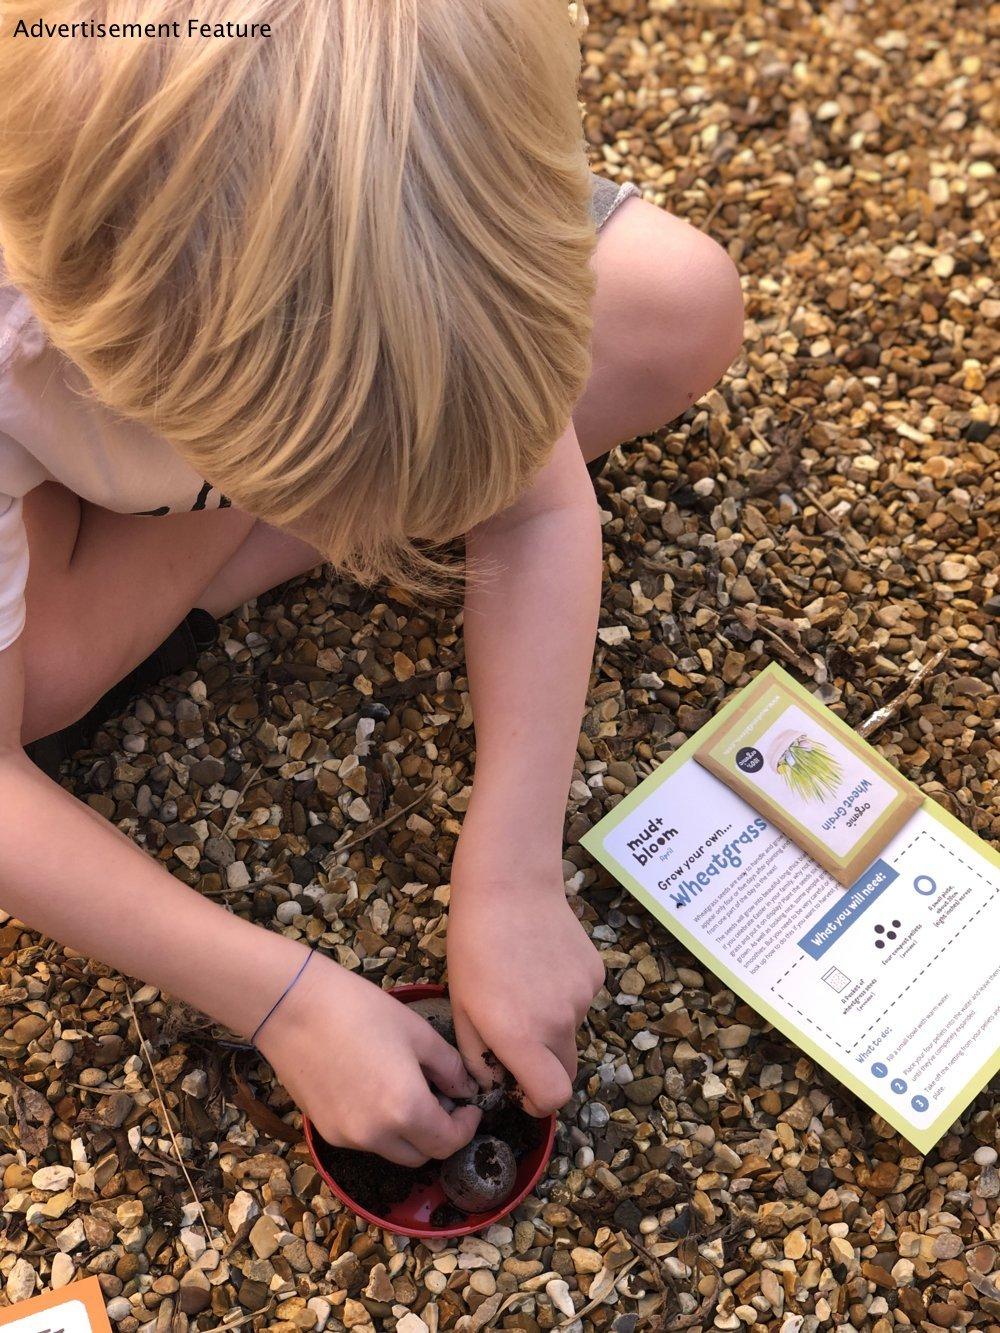 Mud & Bloom kids subscription box - boy planting wheatgrass